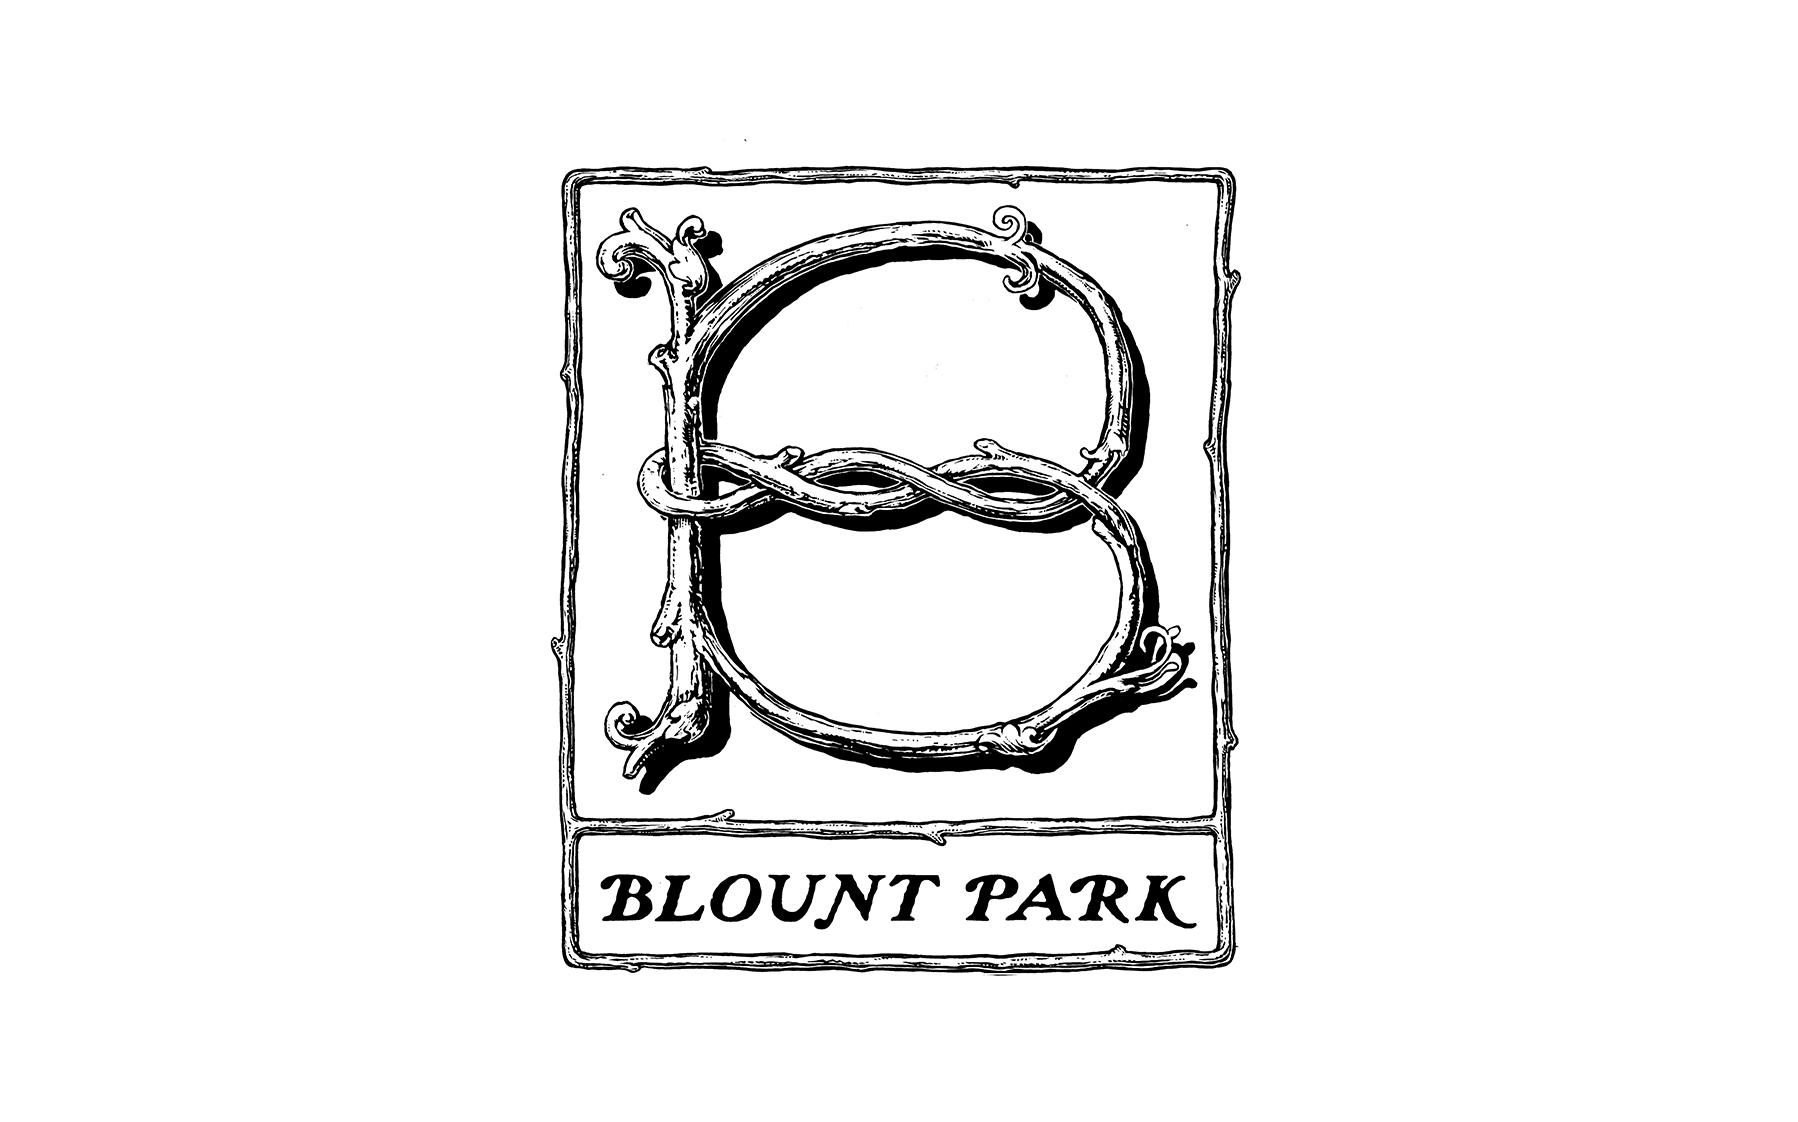 BlountParkLogo.jpg